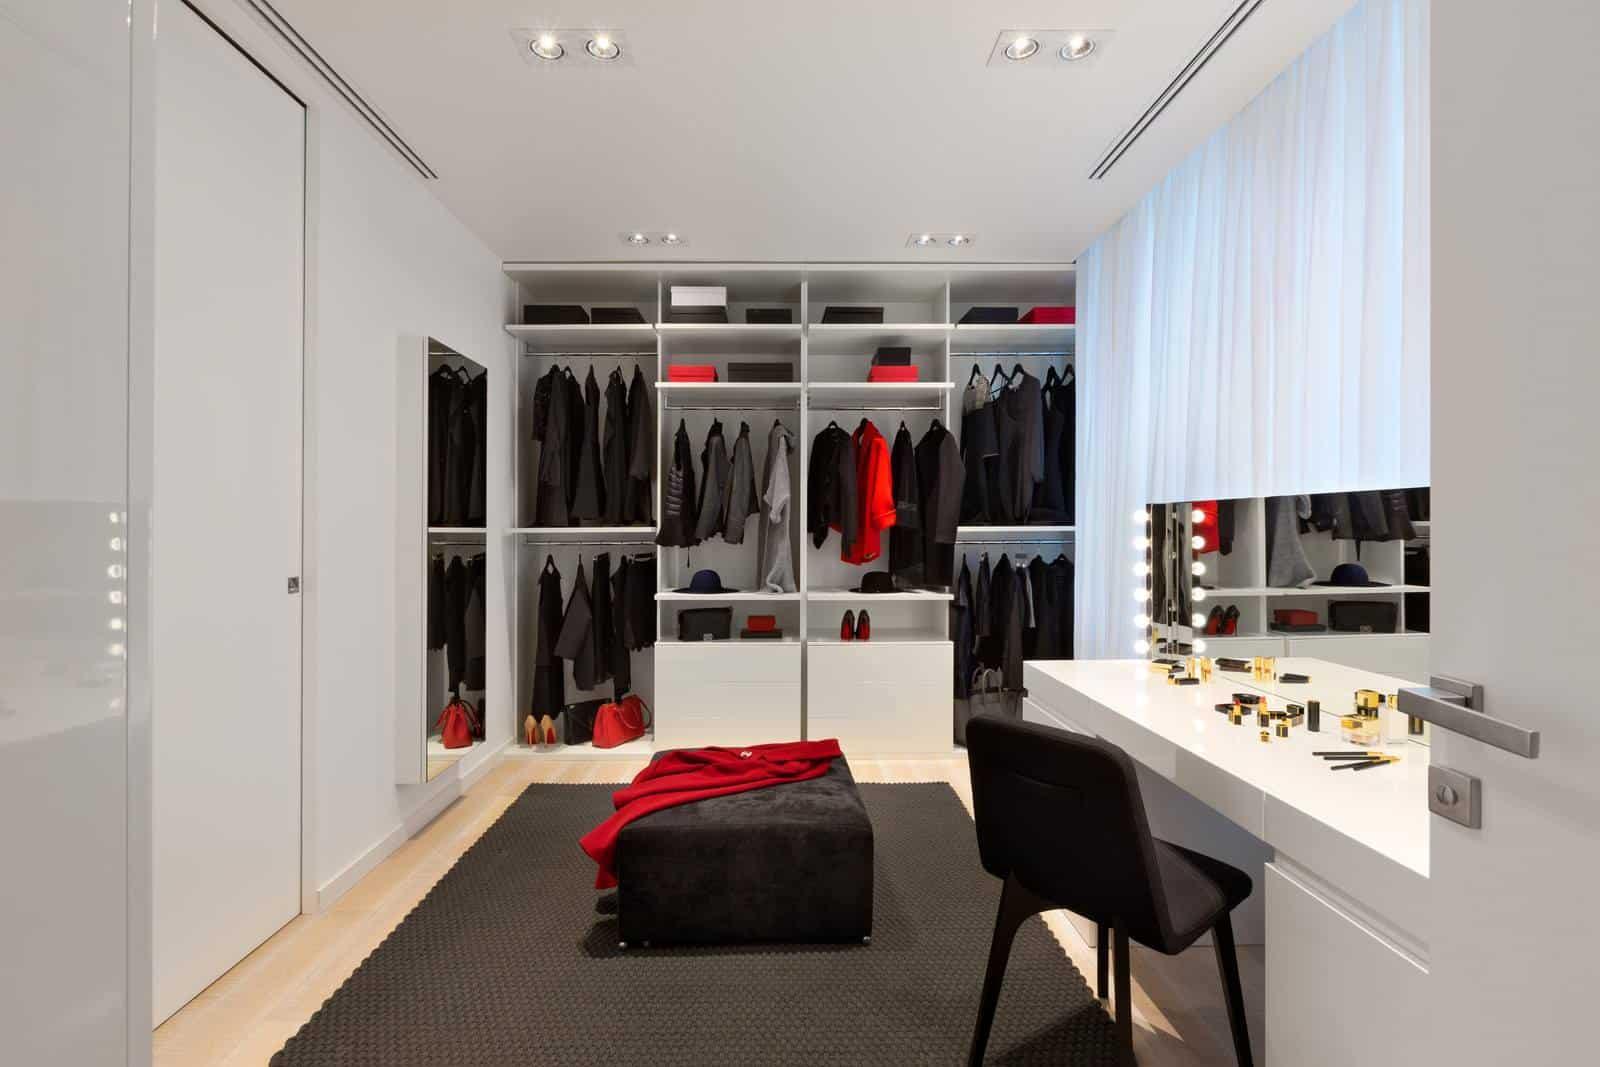 thiet-ke-noi-that-chung-cu-mai-dich-22 Thiết kế nội thất chung cư Mai Dịch - A. Sinh